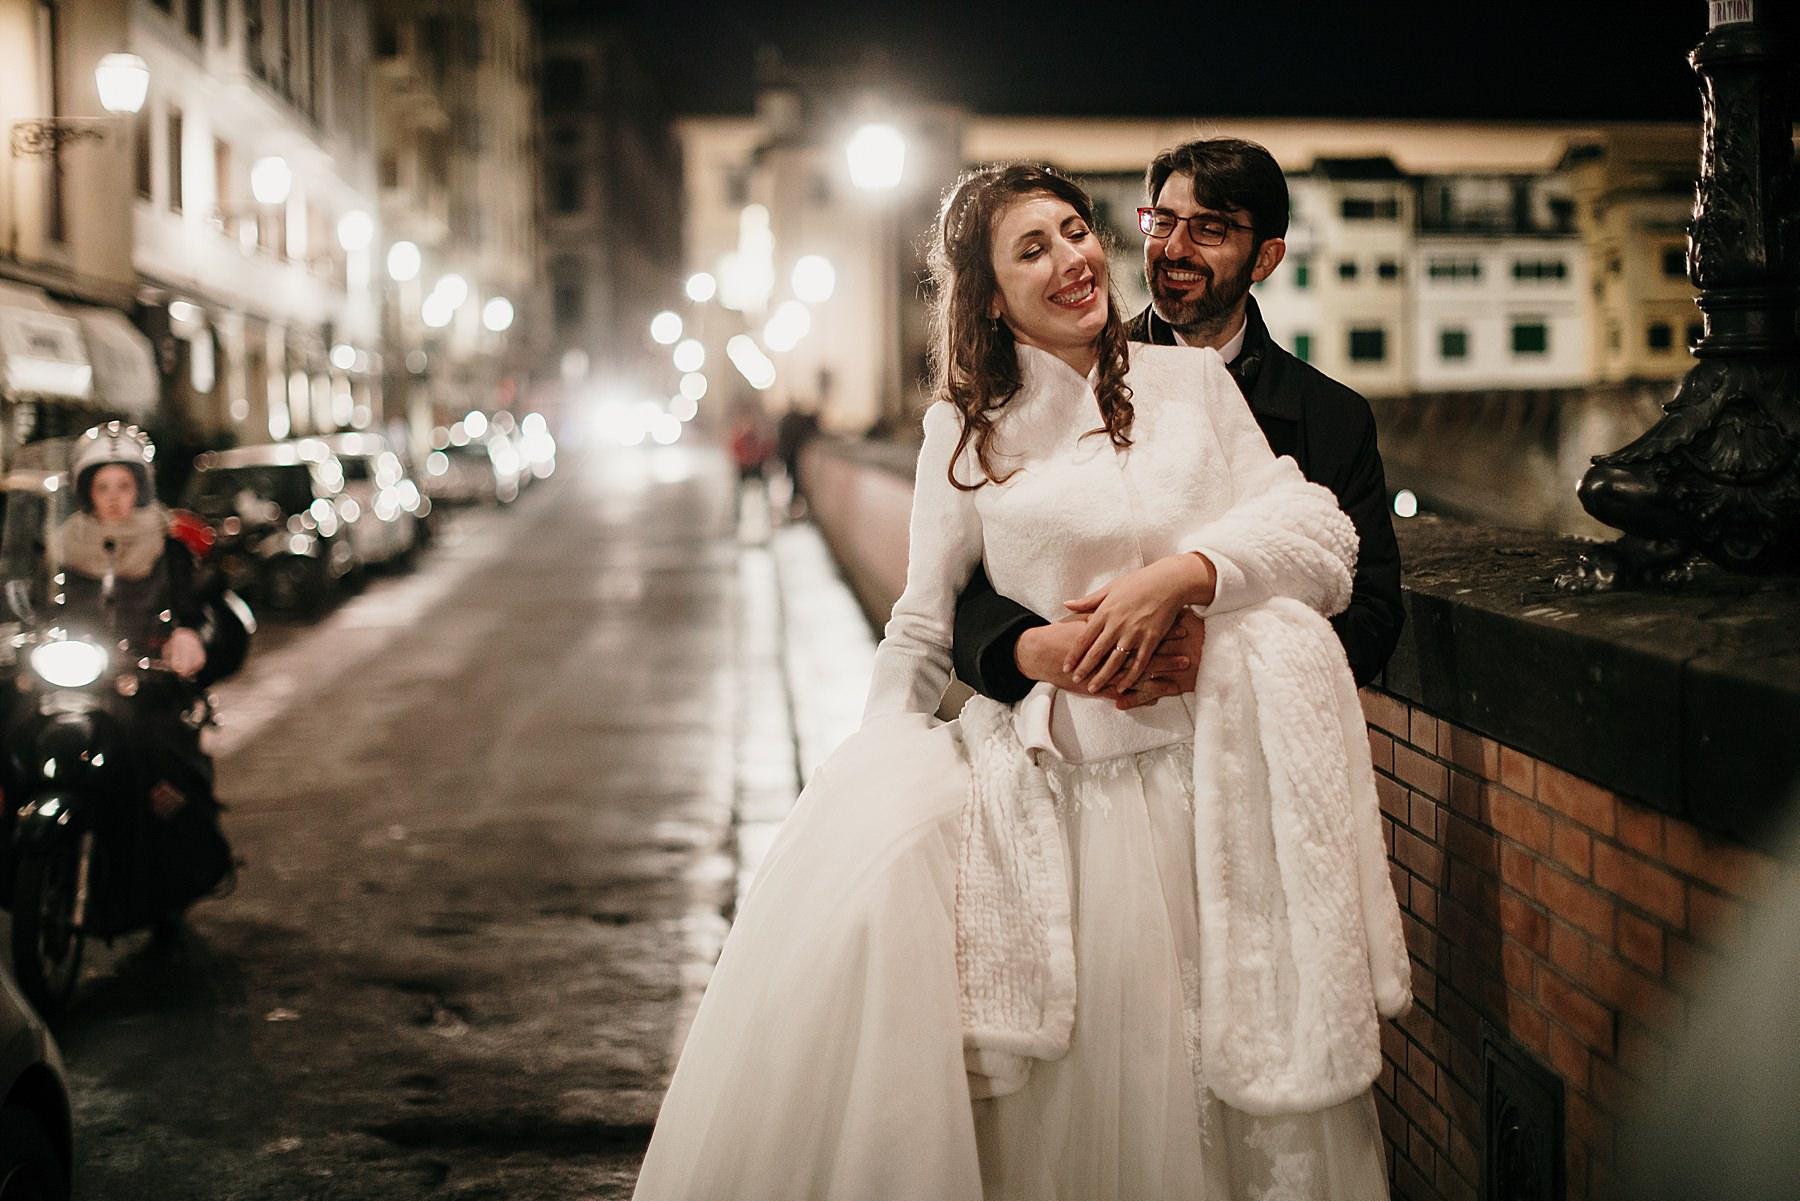 sposi in centro a Firenze a Natale